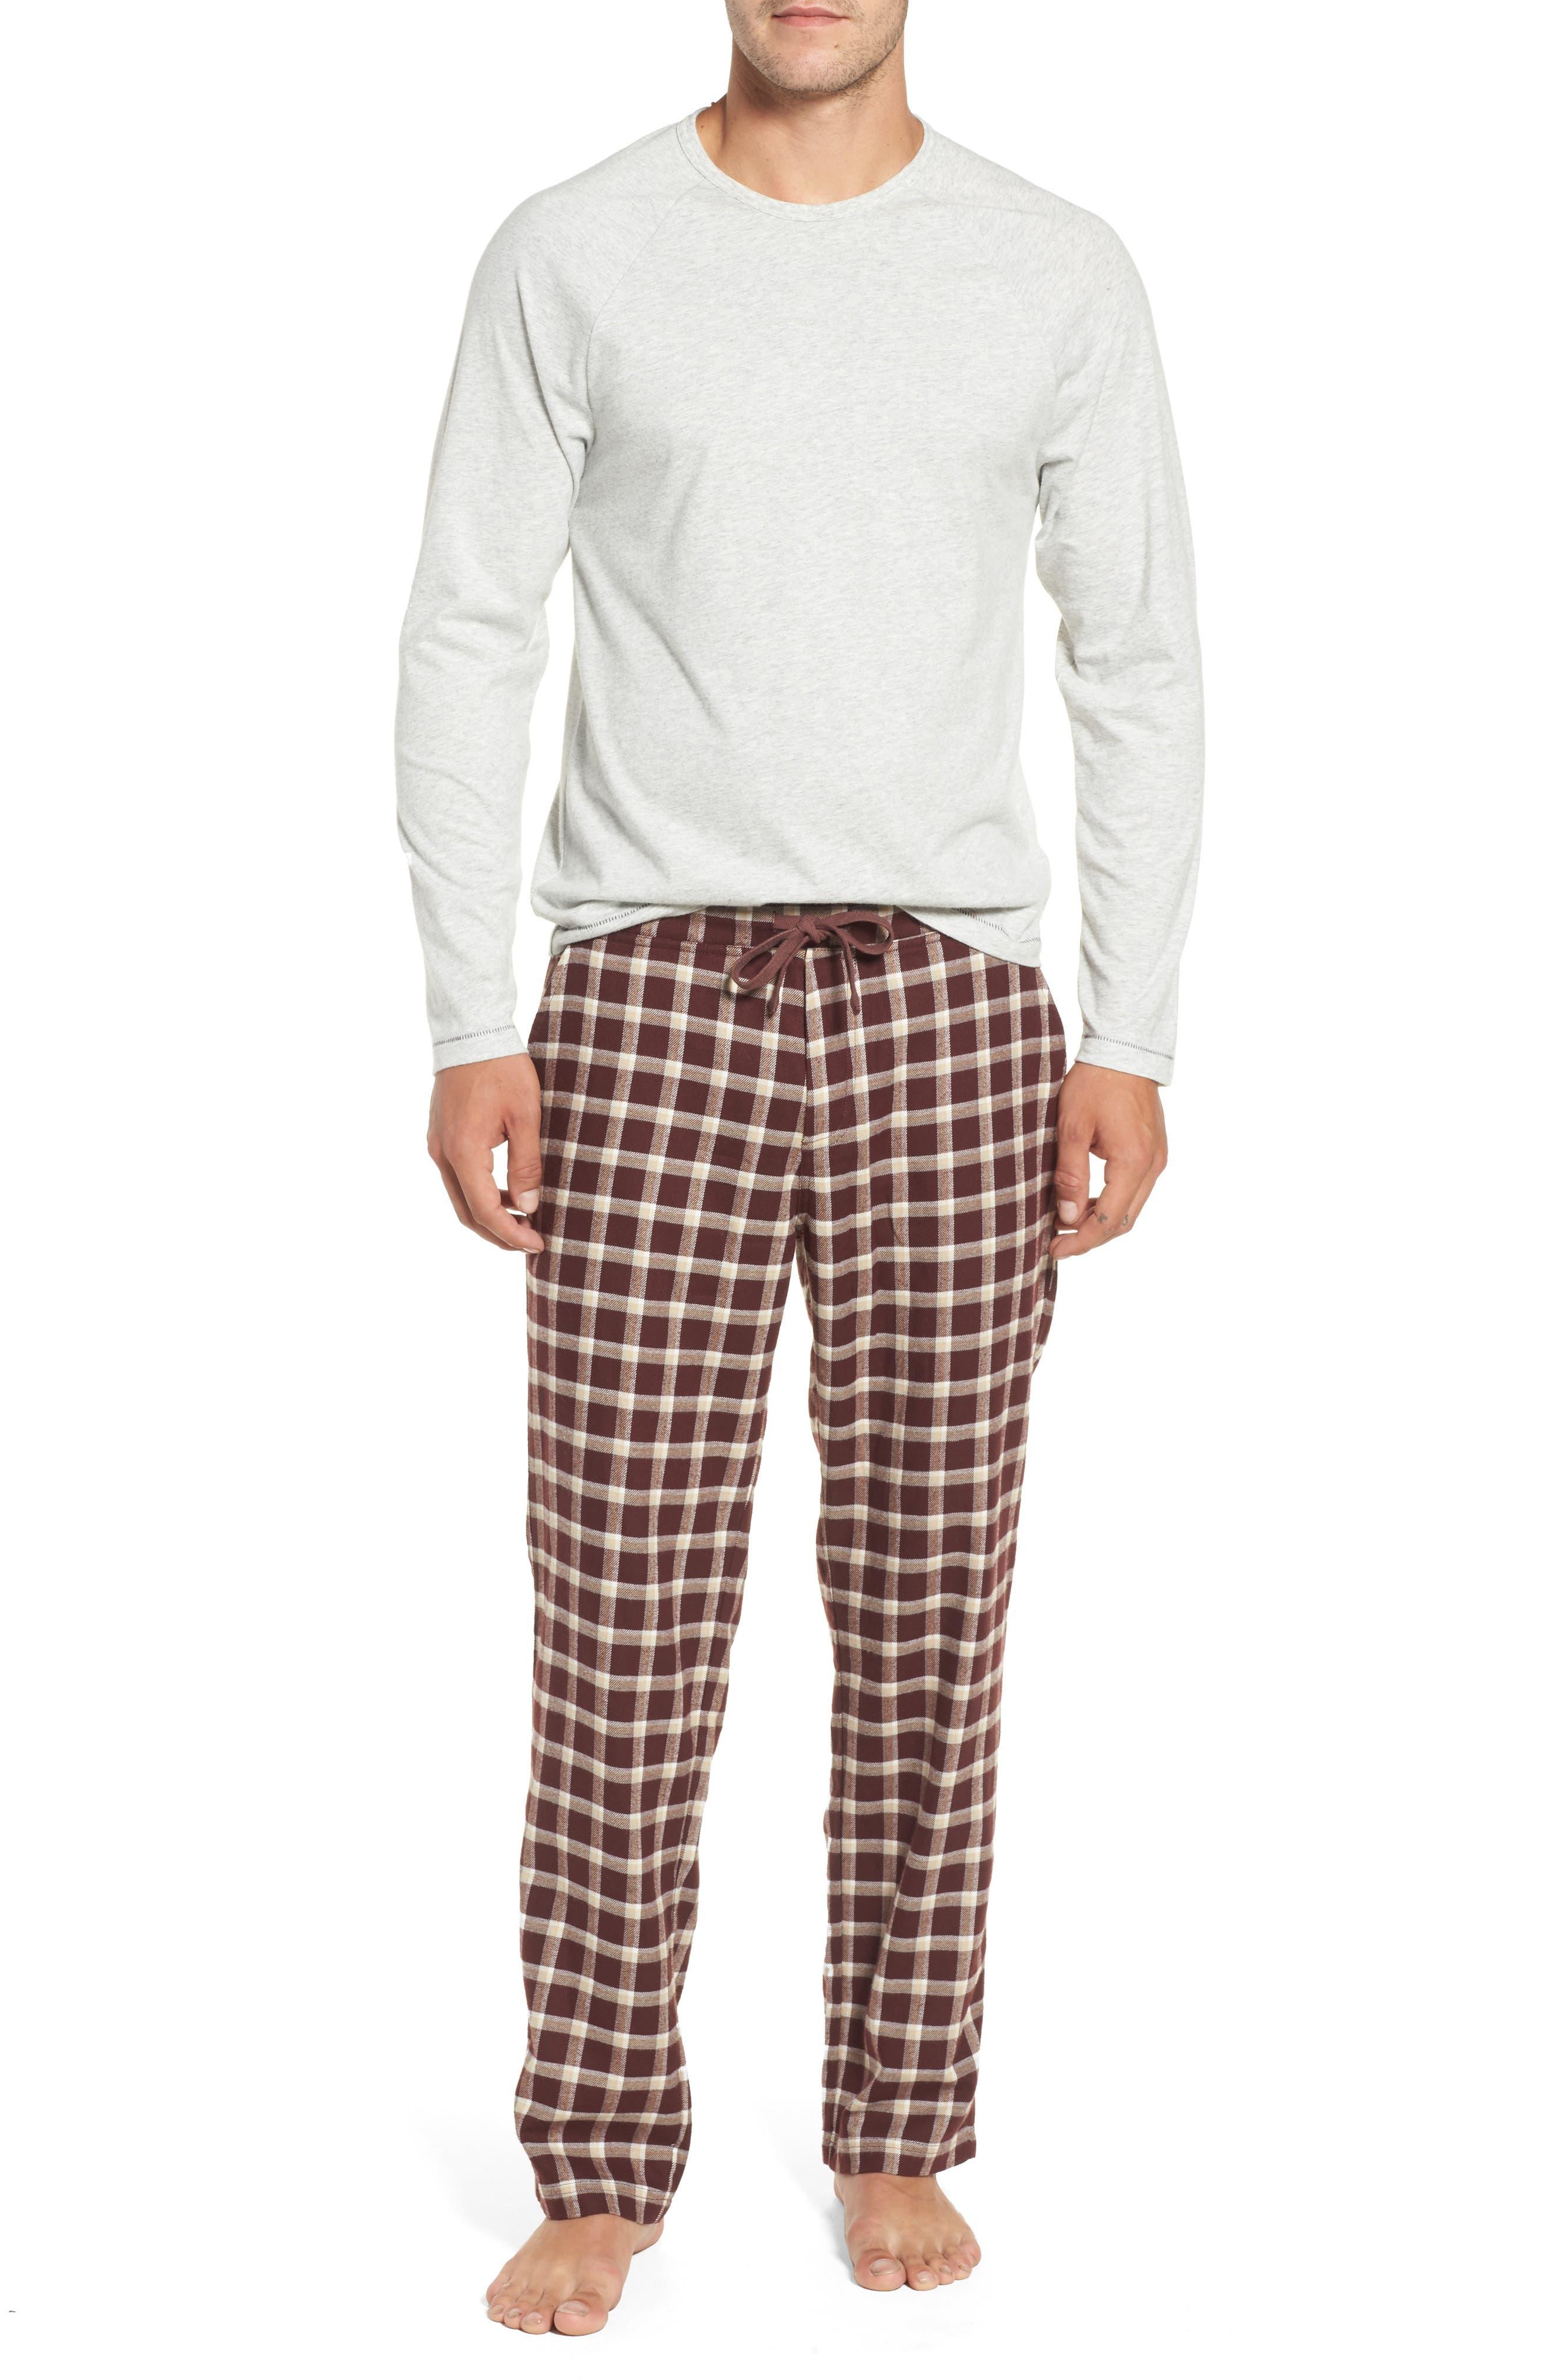 Alternate Image 1 Selected - UGG® Steiner Pajama Set